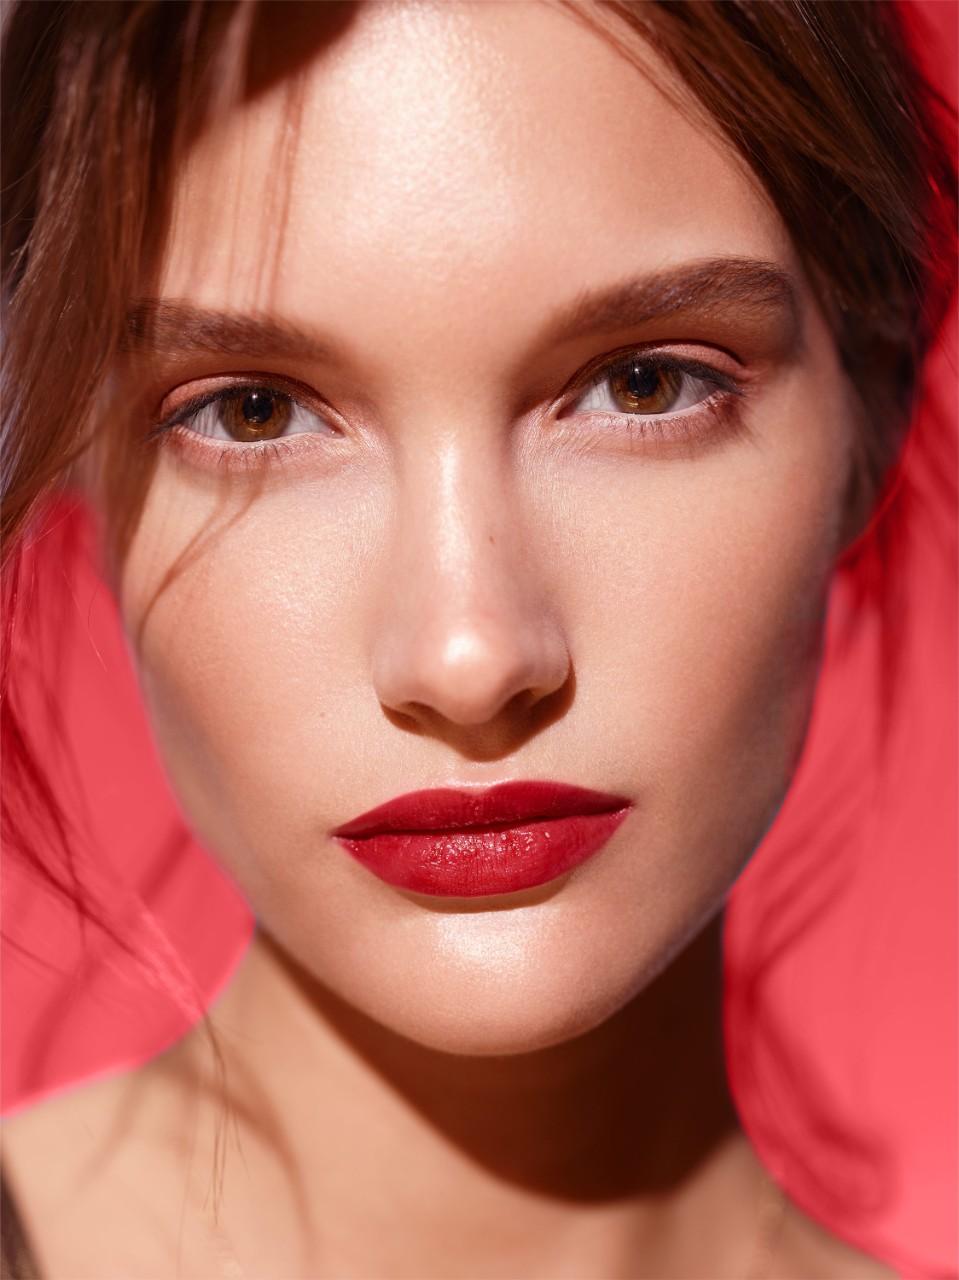 makeup-beautyvisual-red-lipstick-0422-1280-x-1280